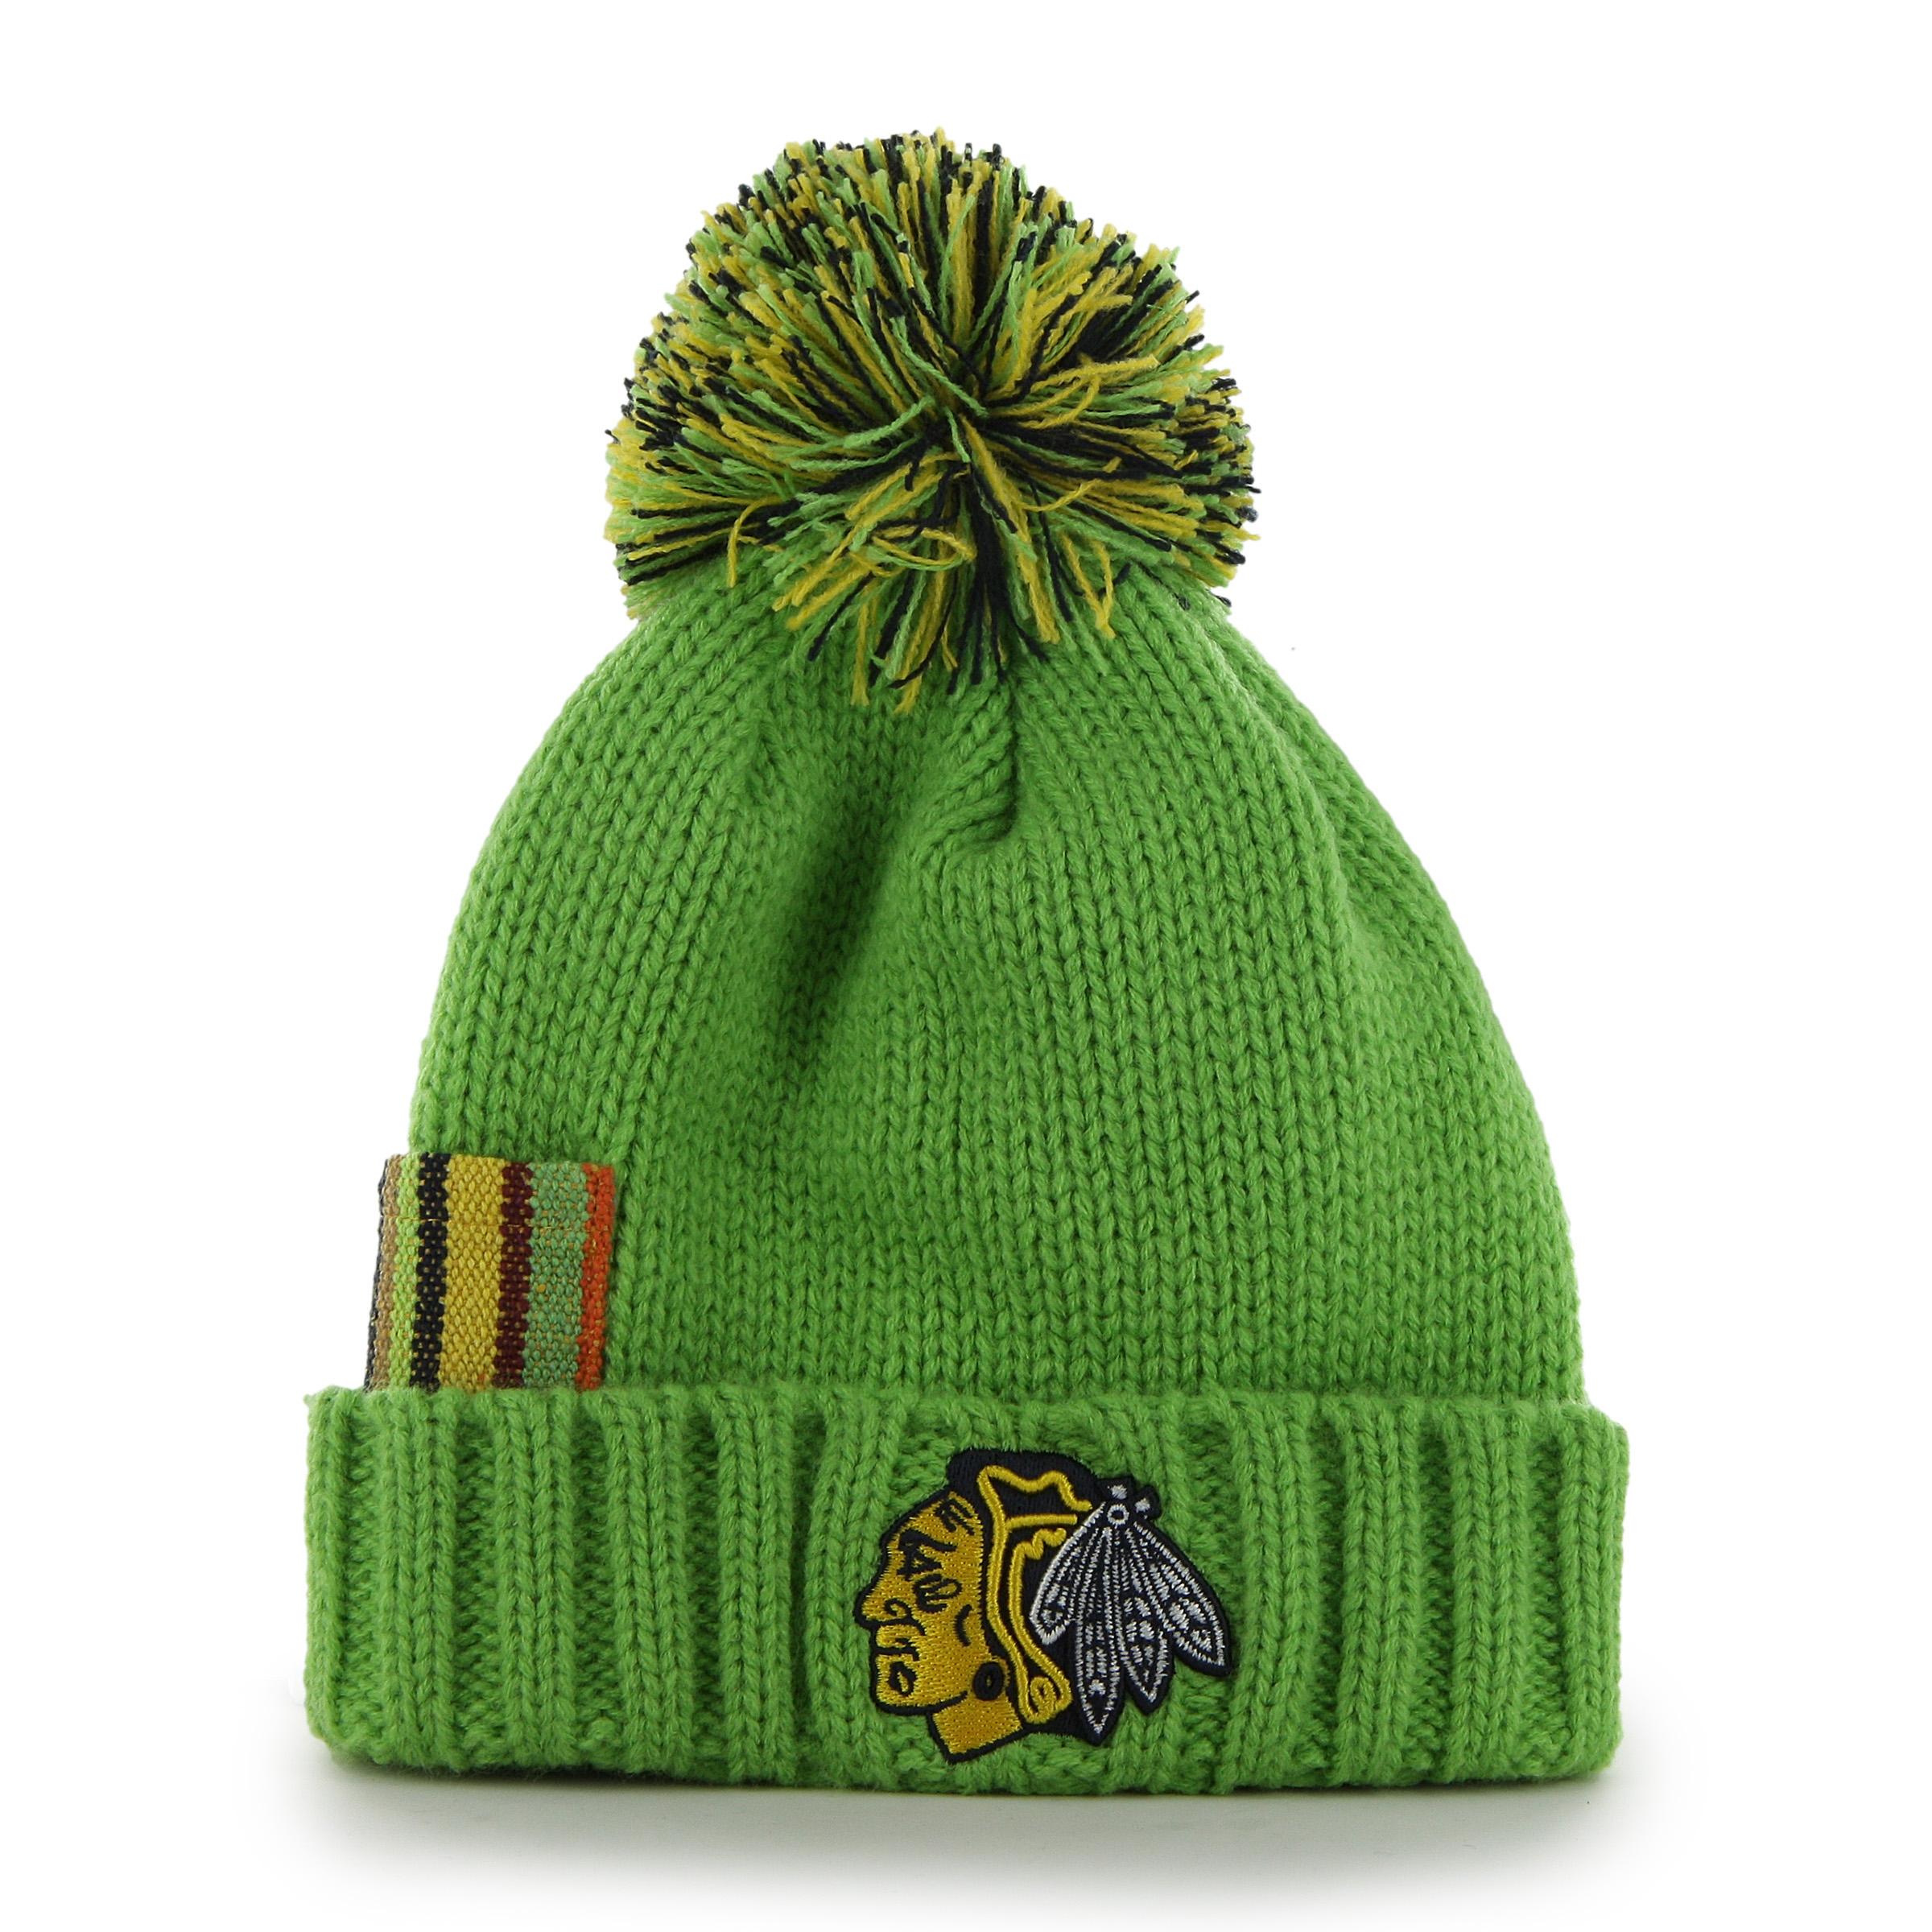 Chicago Blackhawks Pappas Cuff Knit